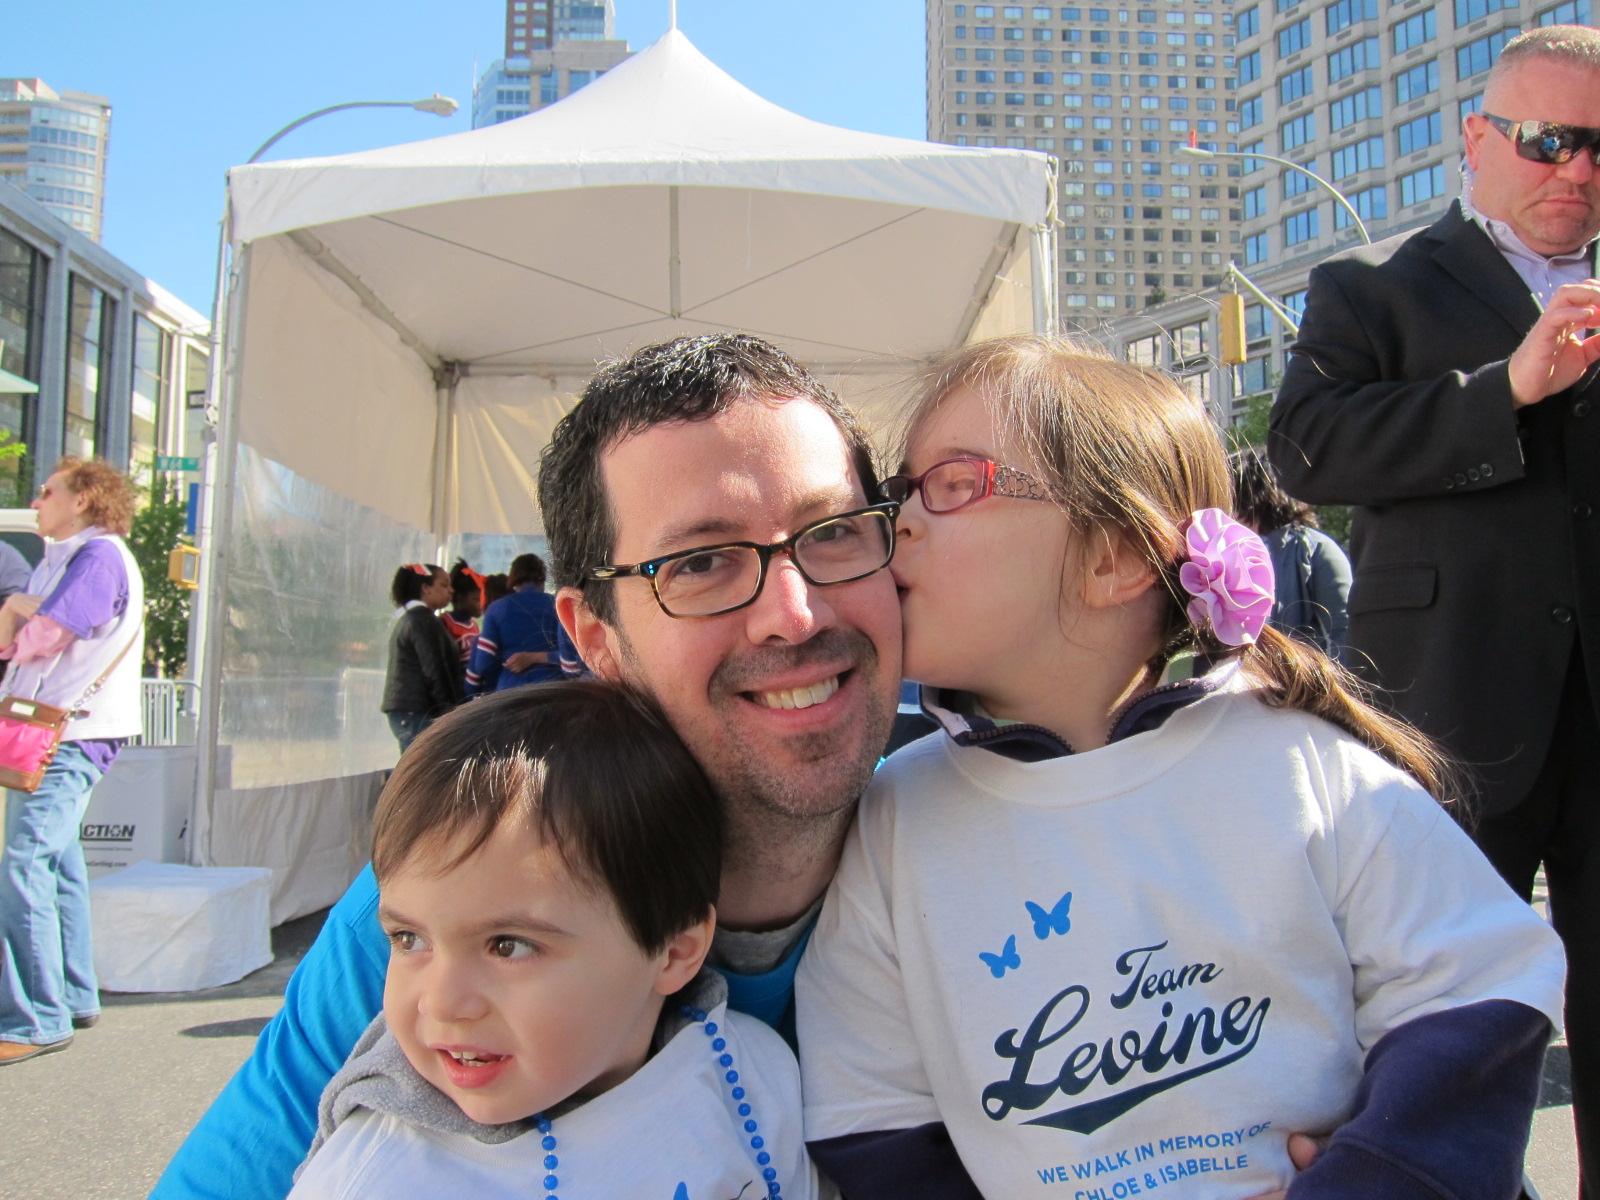 julian-josh--olivia-levine-at-the-2012-march-for-babies-walk_8540260316_o.jpg